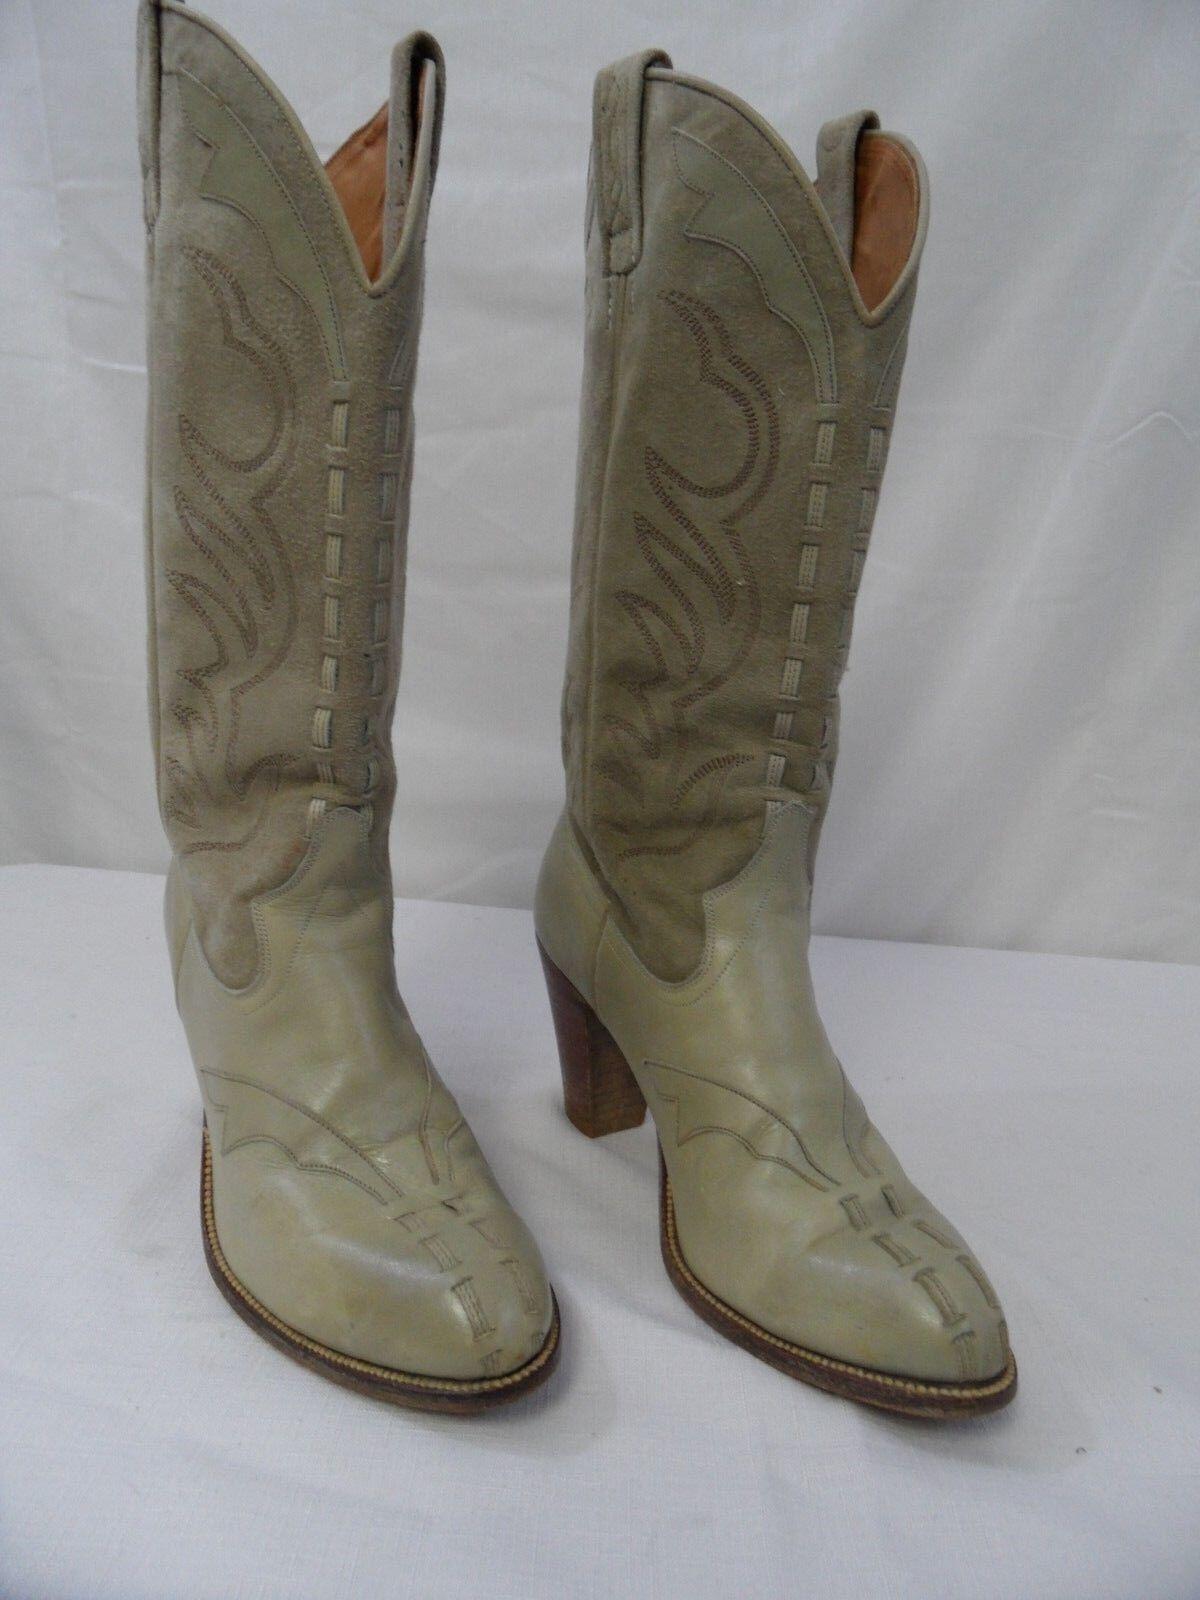 Vintage High Heel 5.5N Dan Post Cowboy Cowgirl Boots Off-White Tan Cream  Spain